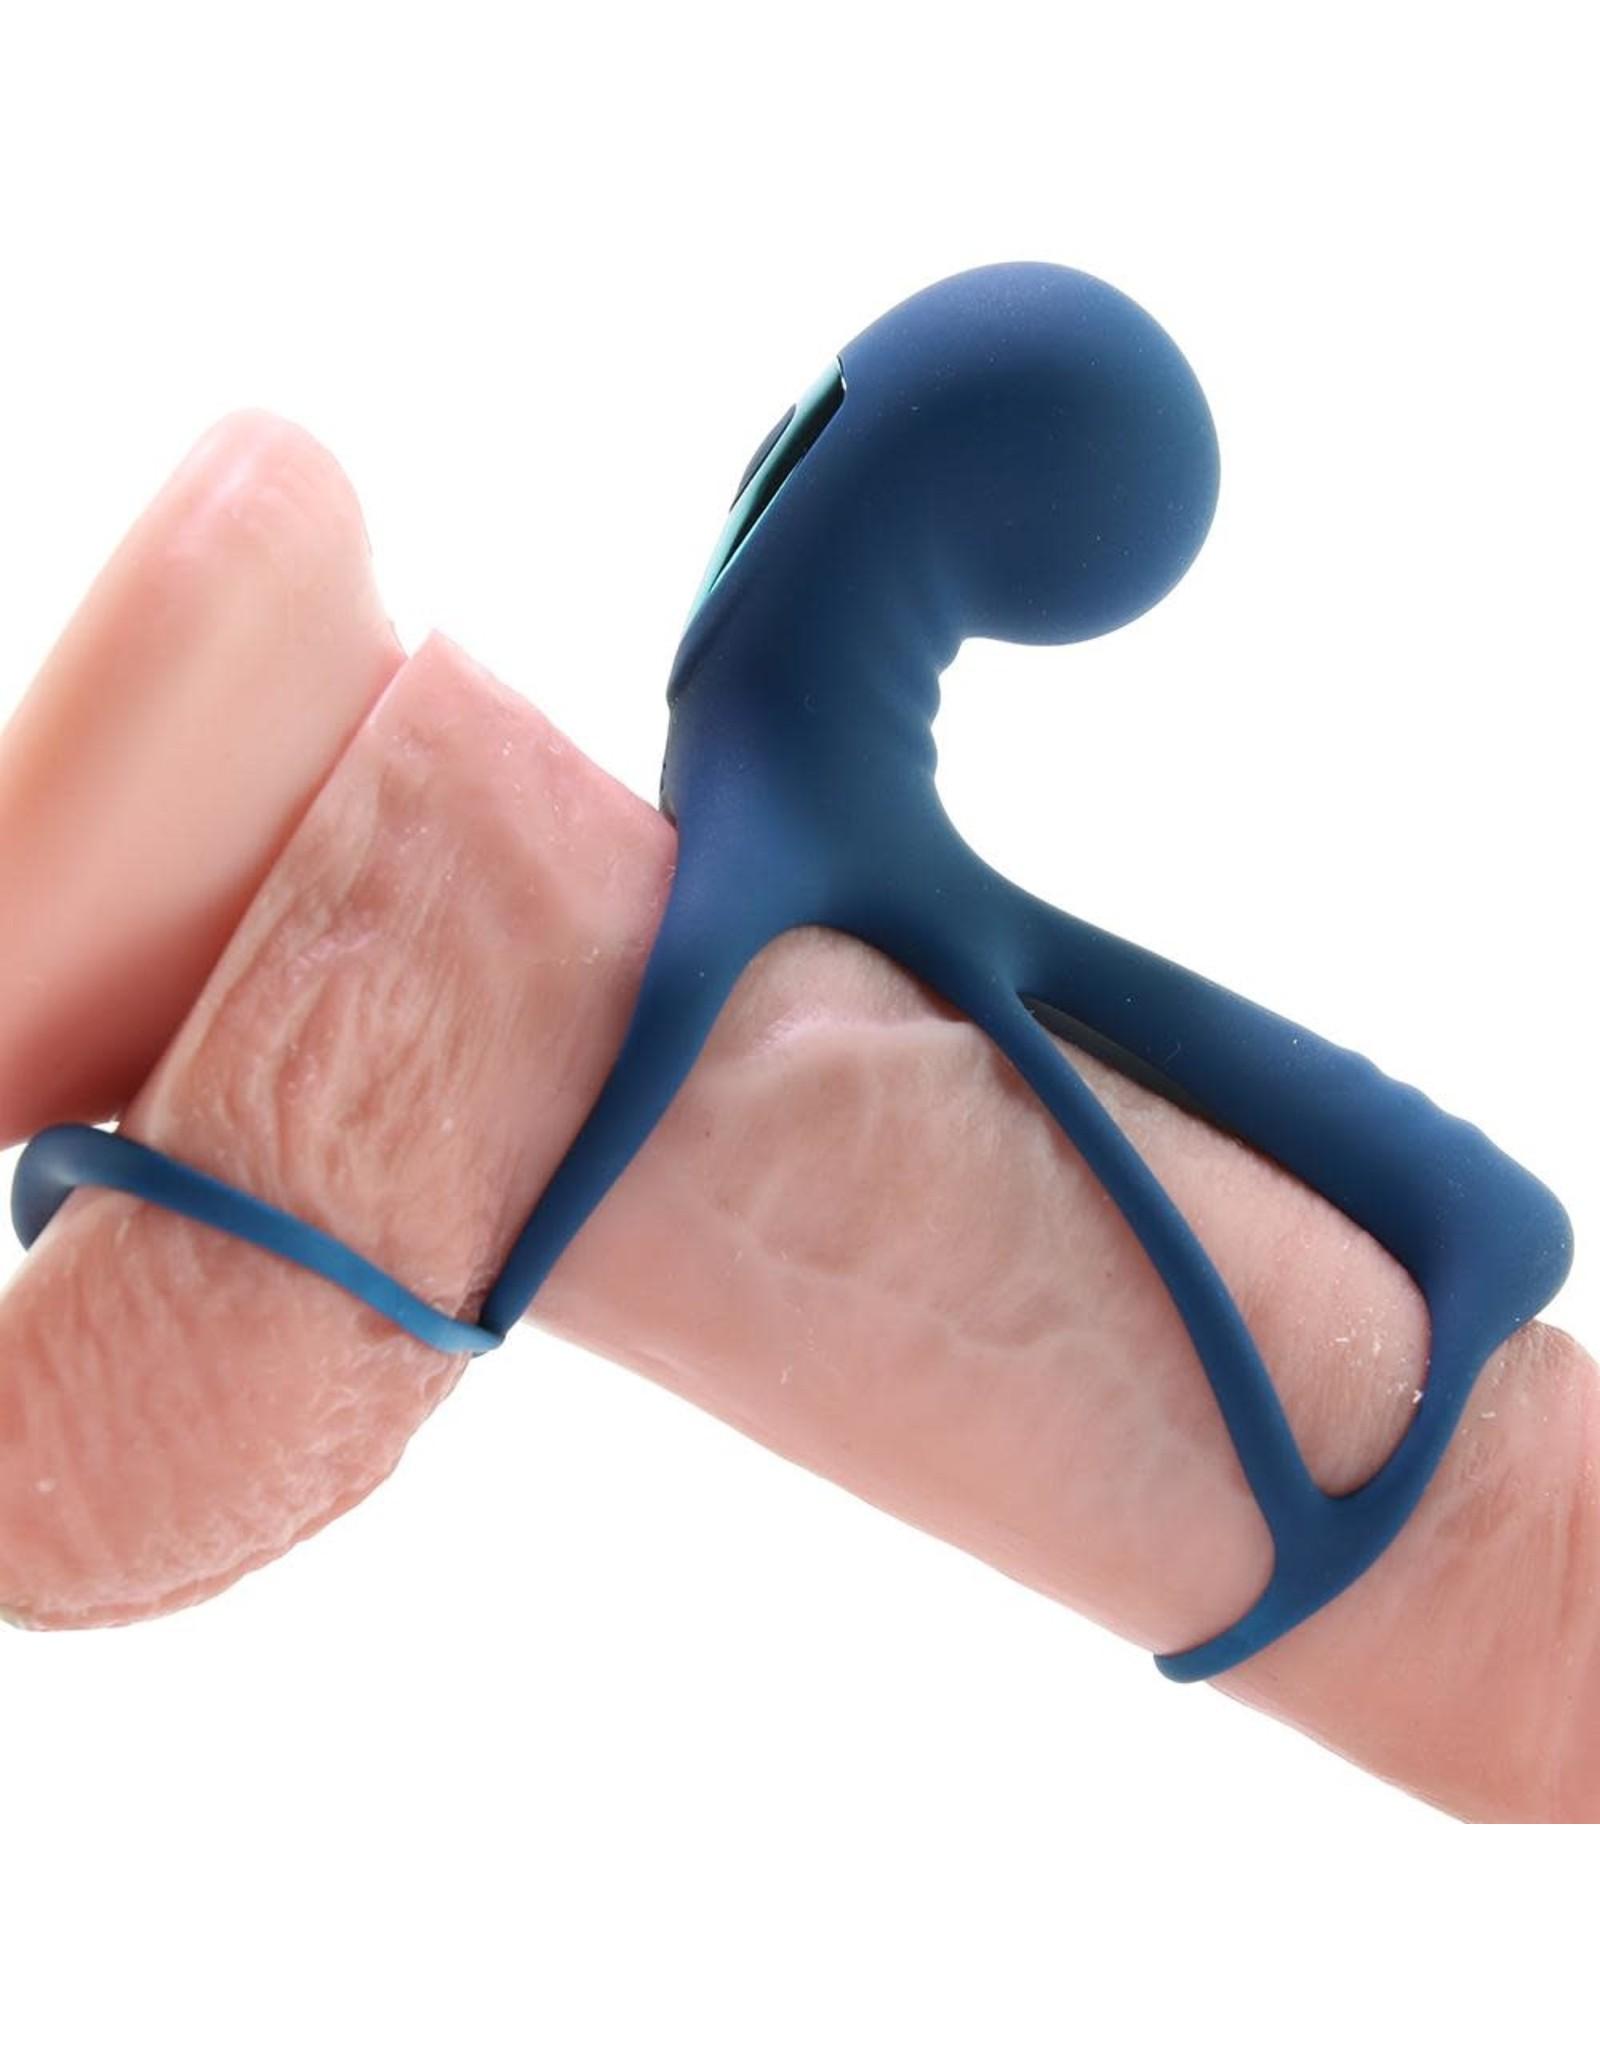 NS - RENEGADE GLADIATOR PENIS HARNESS - BLUE